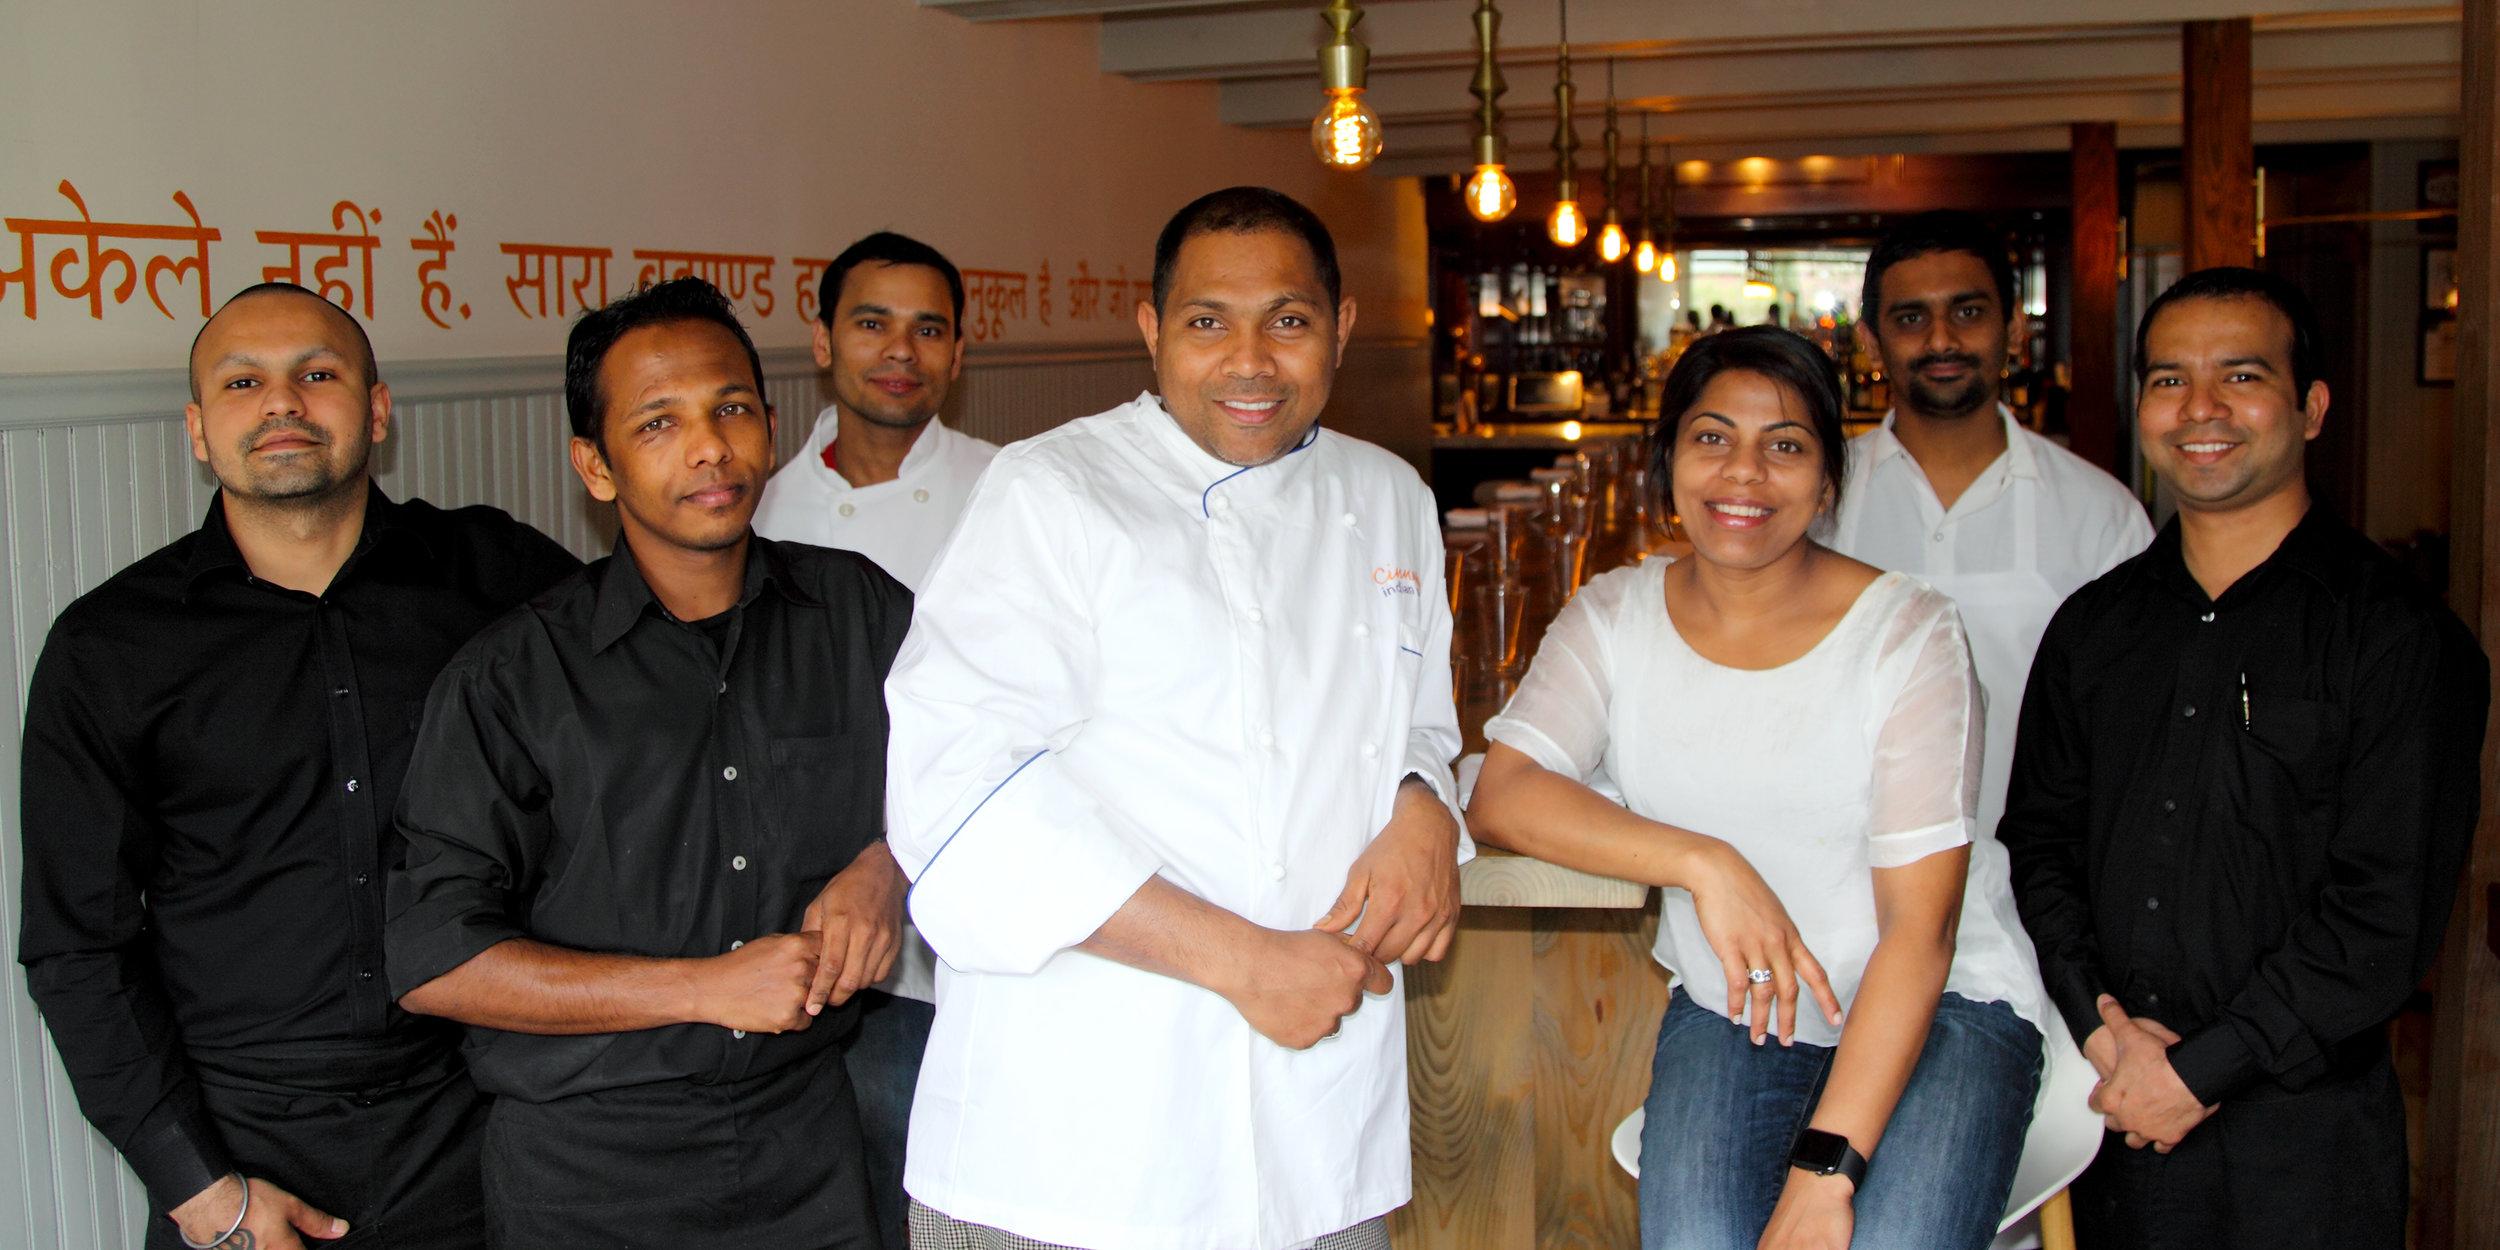 cinnamon-rhinebeck-restaurant-staff.jpg